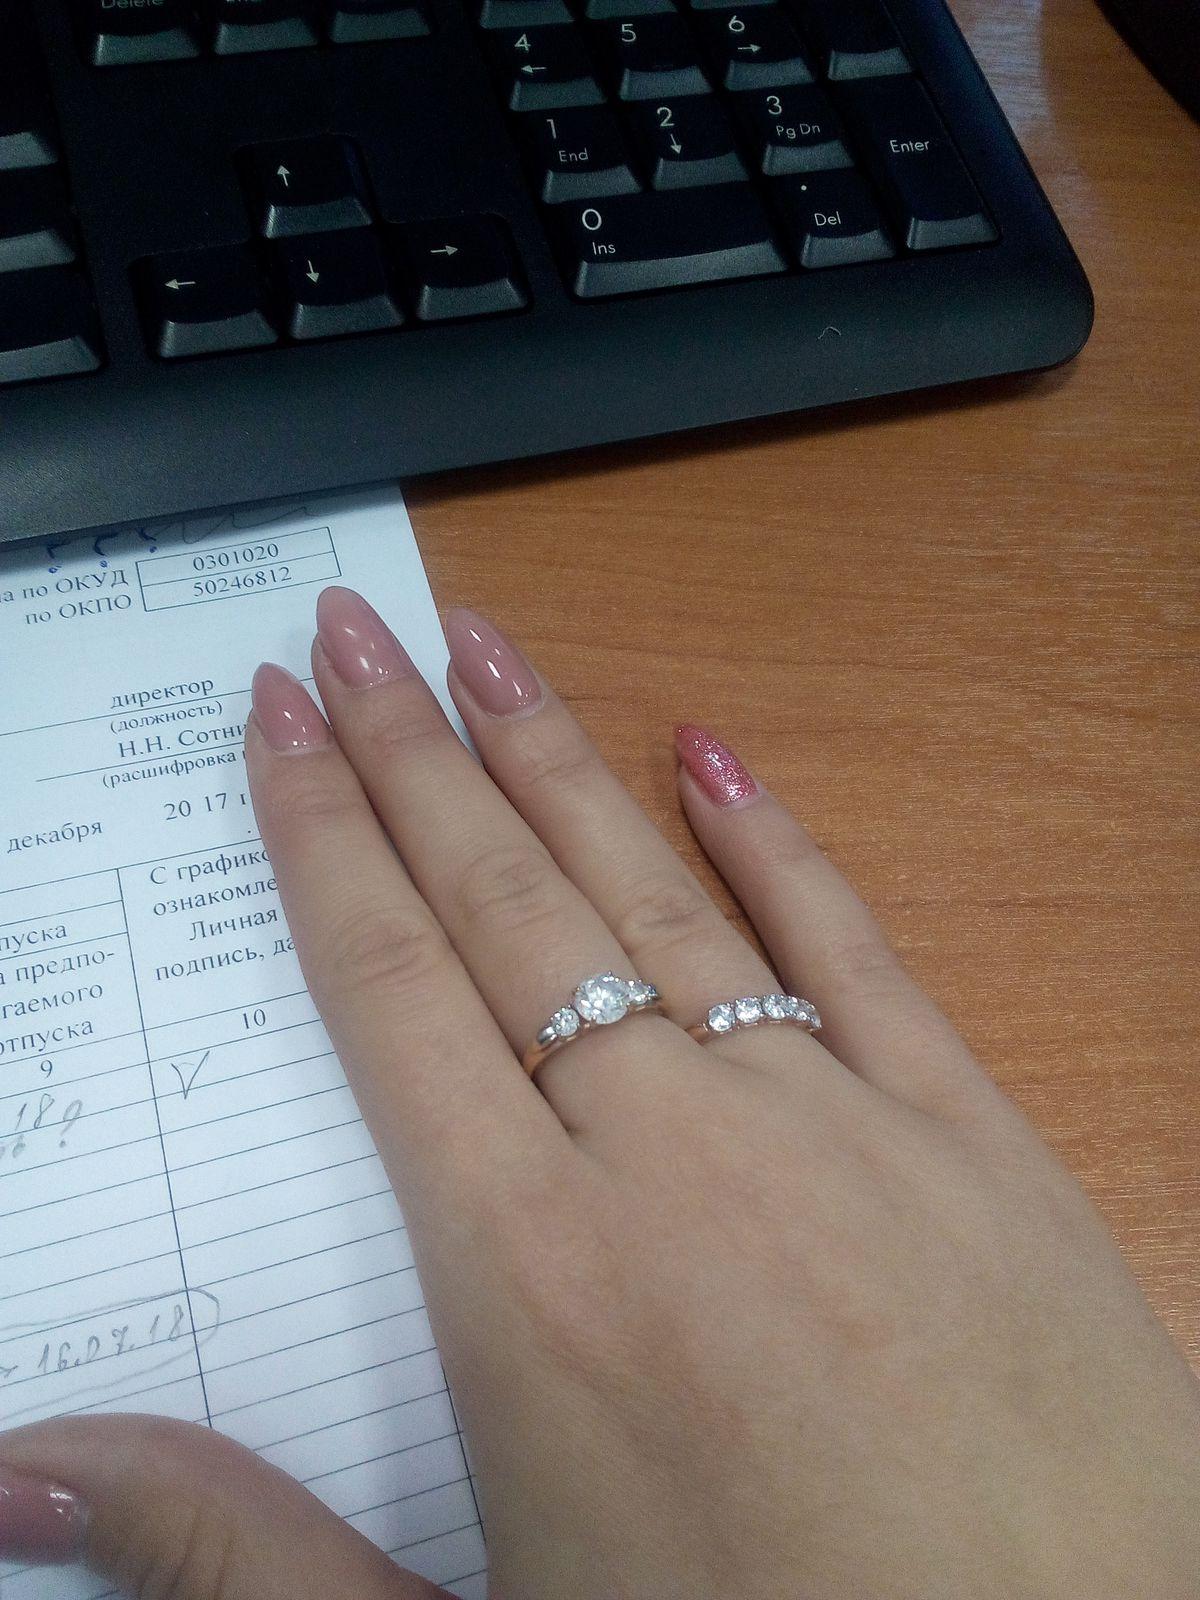 😻🌸😻🌸👑💃🎀🎁🌹красивое кольцо